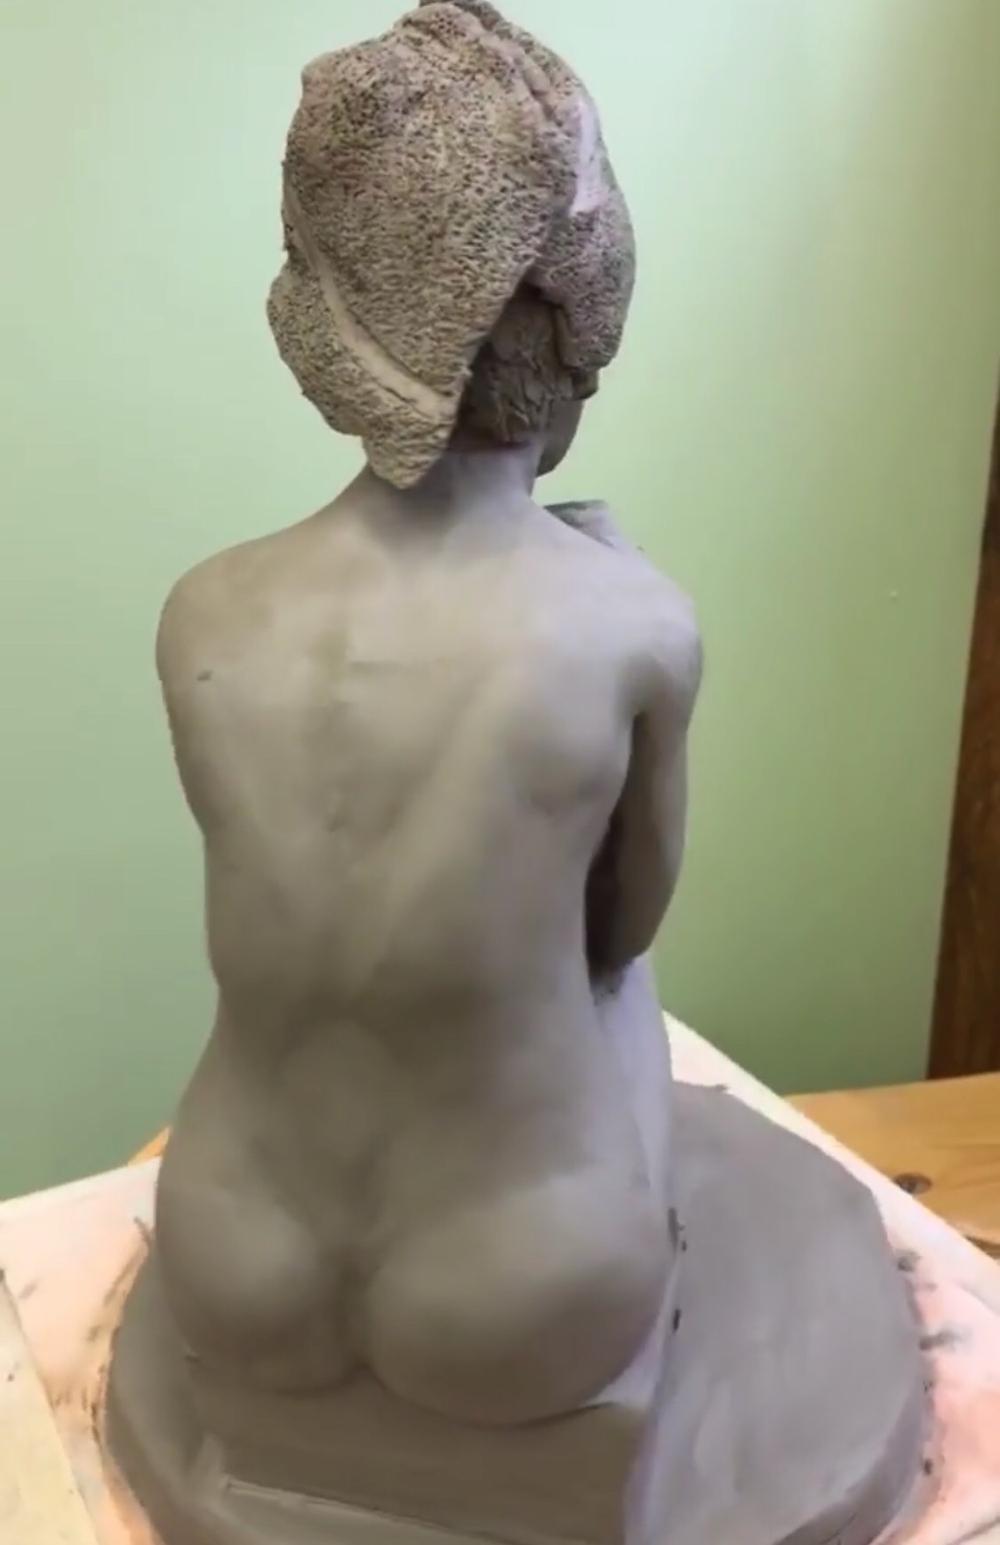 """Bathroom Break"" Sculpture created by Dr. De La Cruz, Houston Plastic Surgeon"